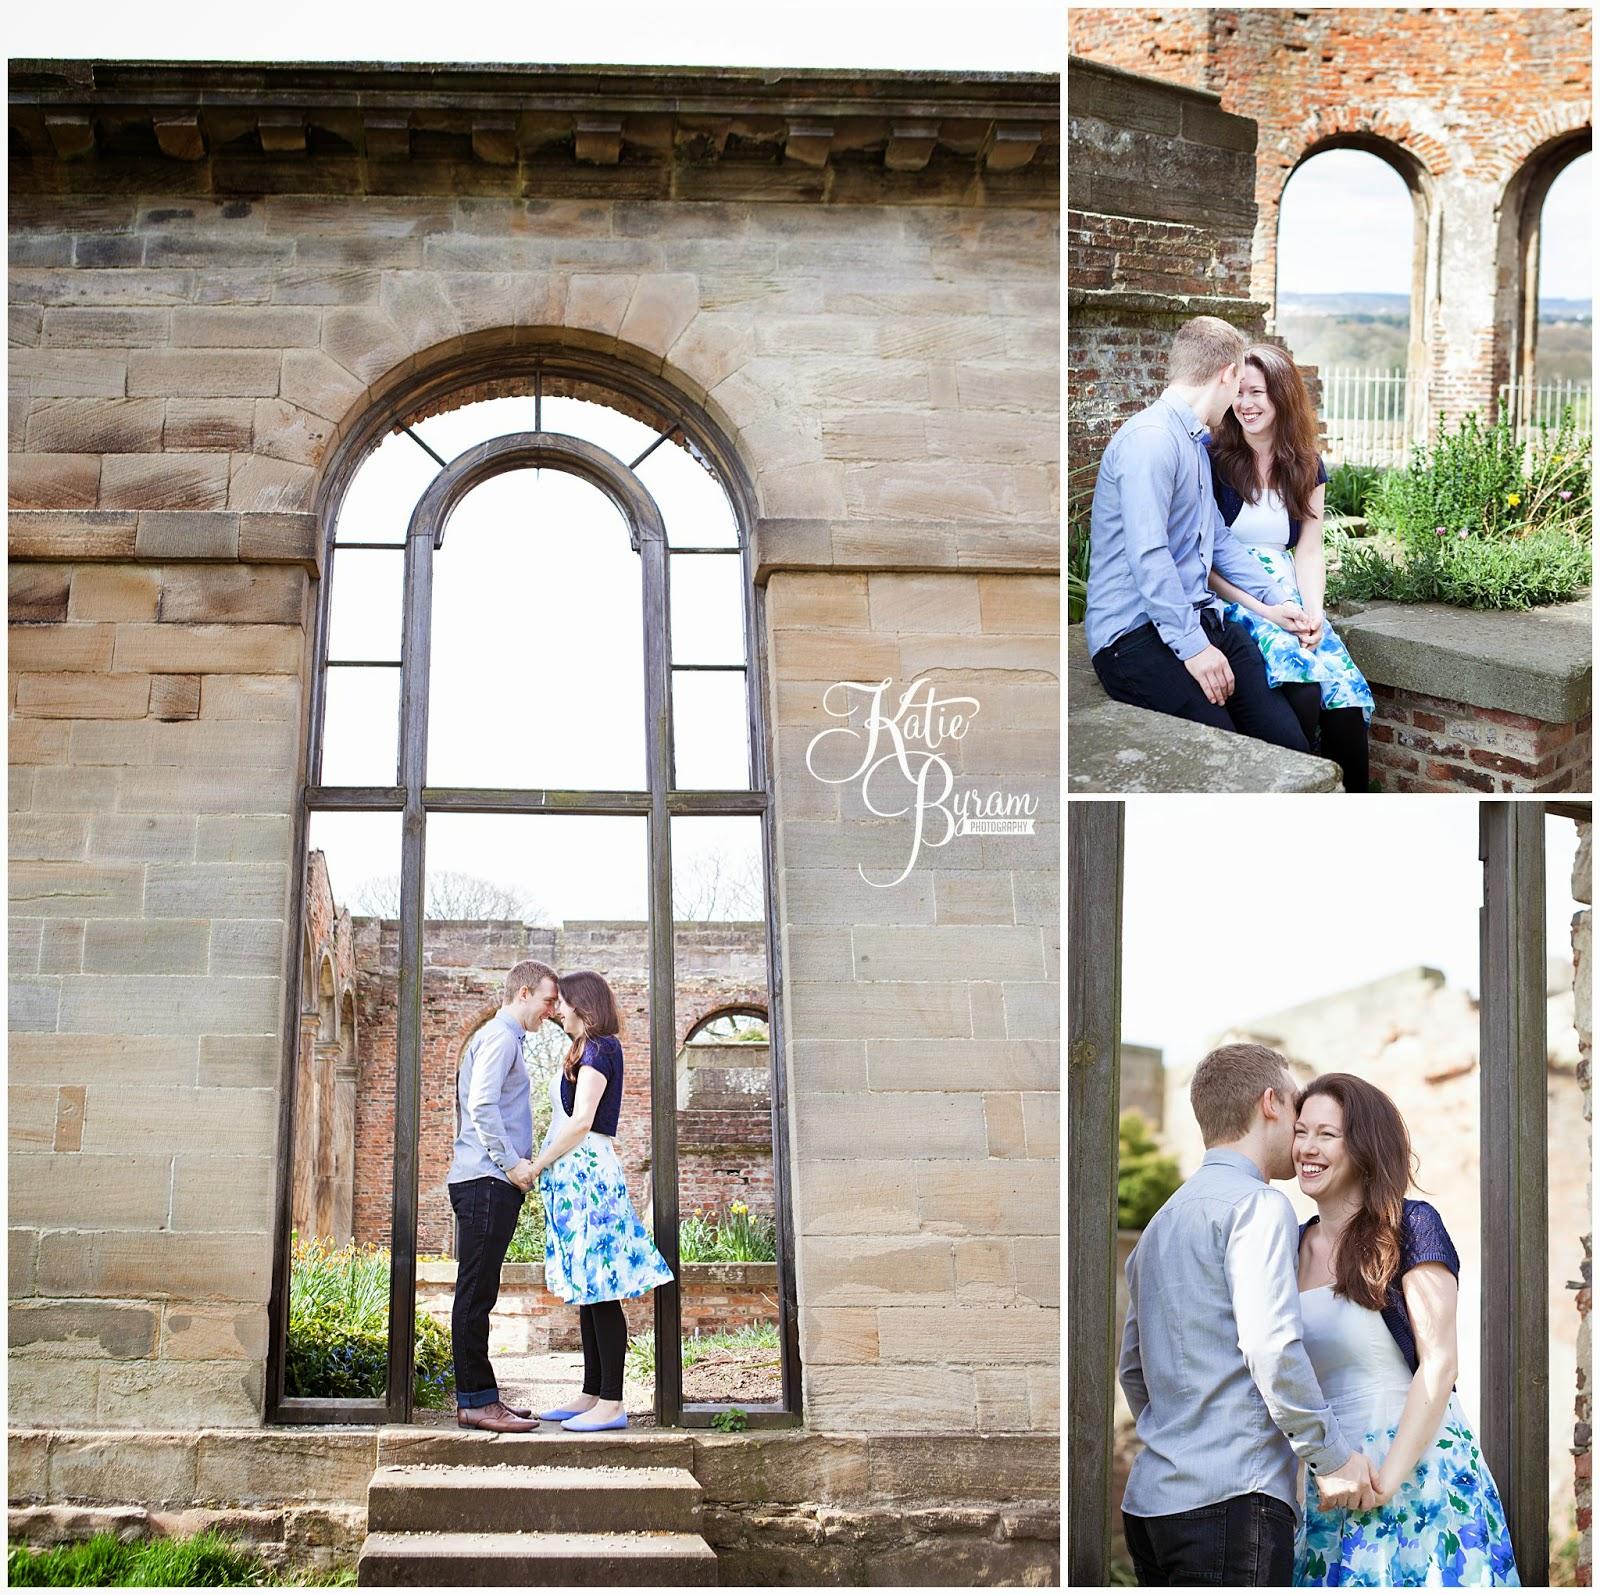 gibside wedding, gibside chapel, humanist wedding, pre-wedding shoot, outdoor wedding locations north east, katie byram photography, national trust wedding